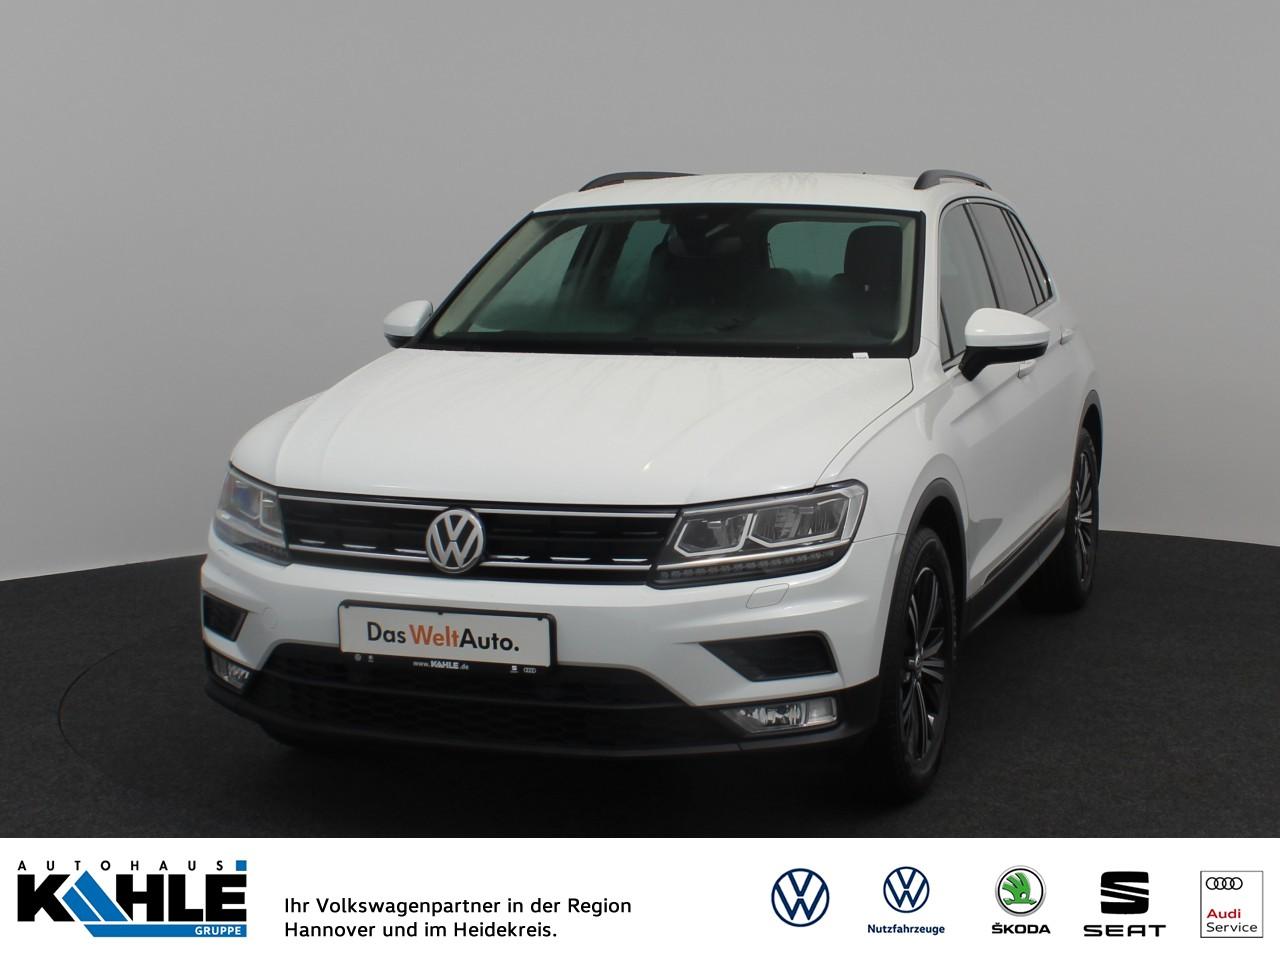 Volkswagen Tiguan 1.4 TSI DSG Comfortline Navi LED Klima ACC, Jahr 2016, Benzin